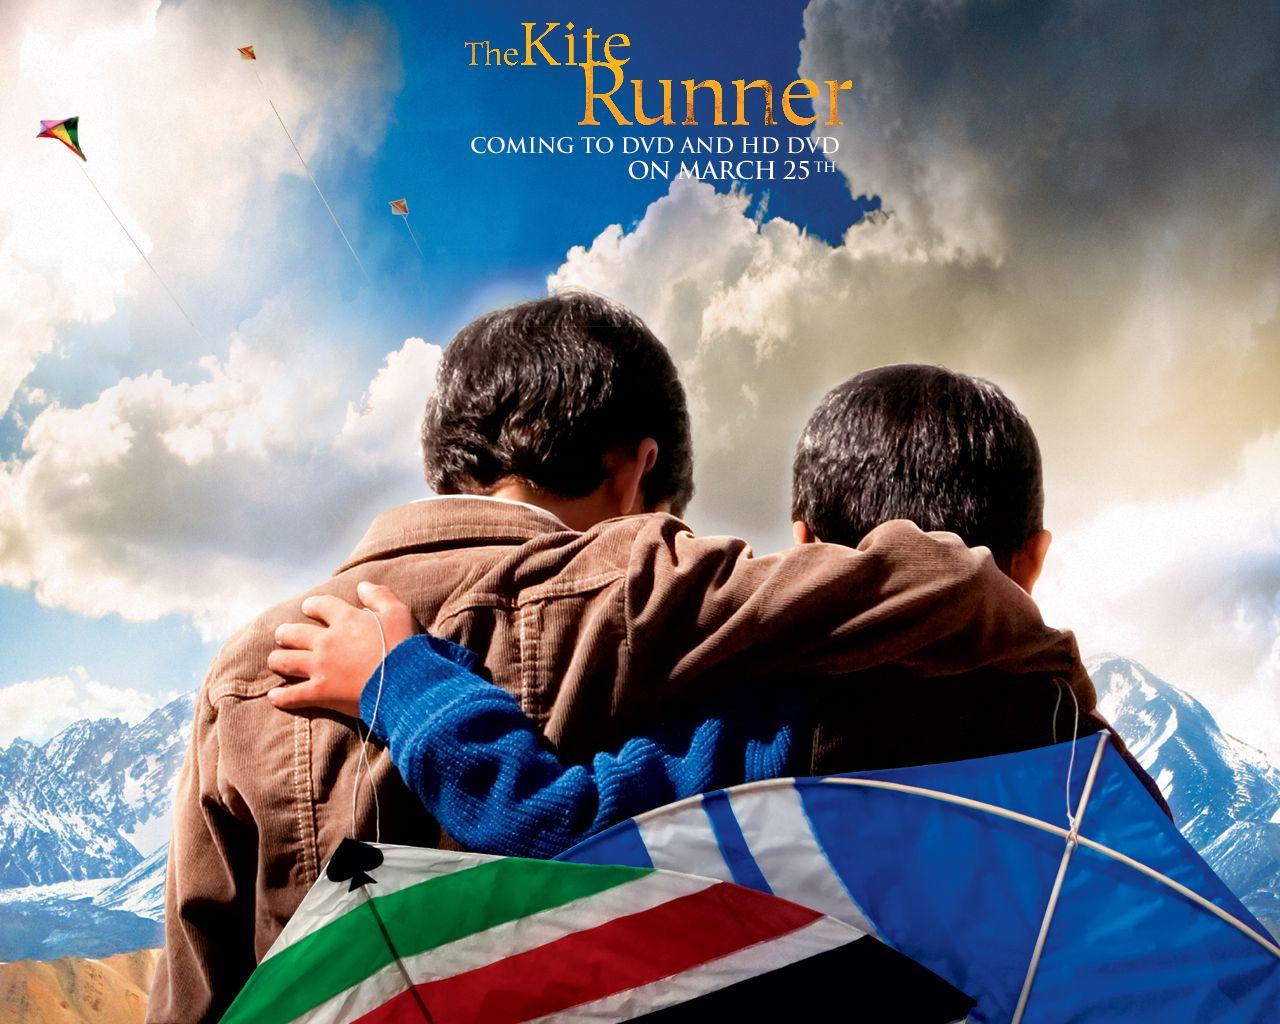 Watch Streaming HD The Kite Runner, starring Khalid